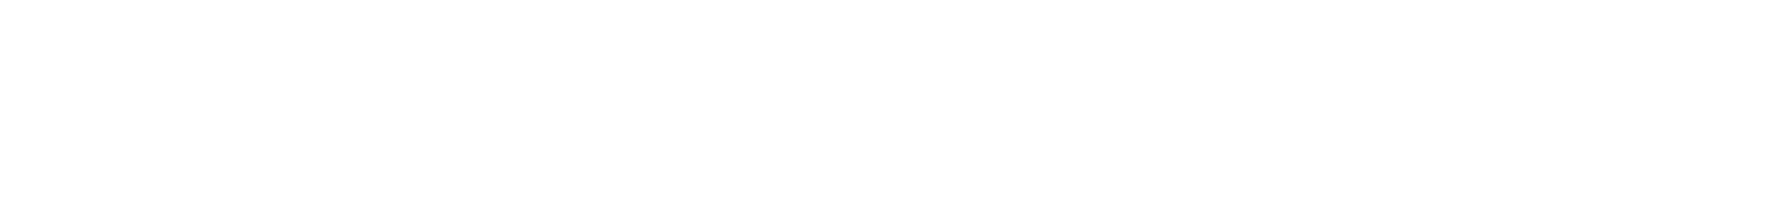 detournement-logo-white-on-trans